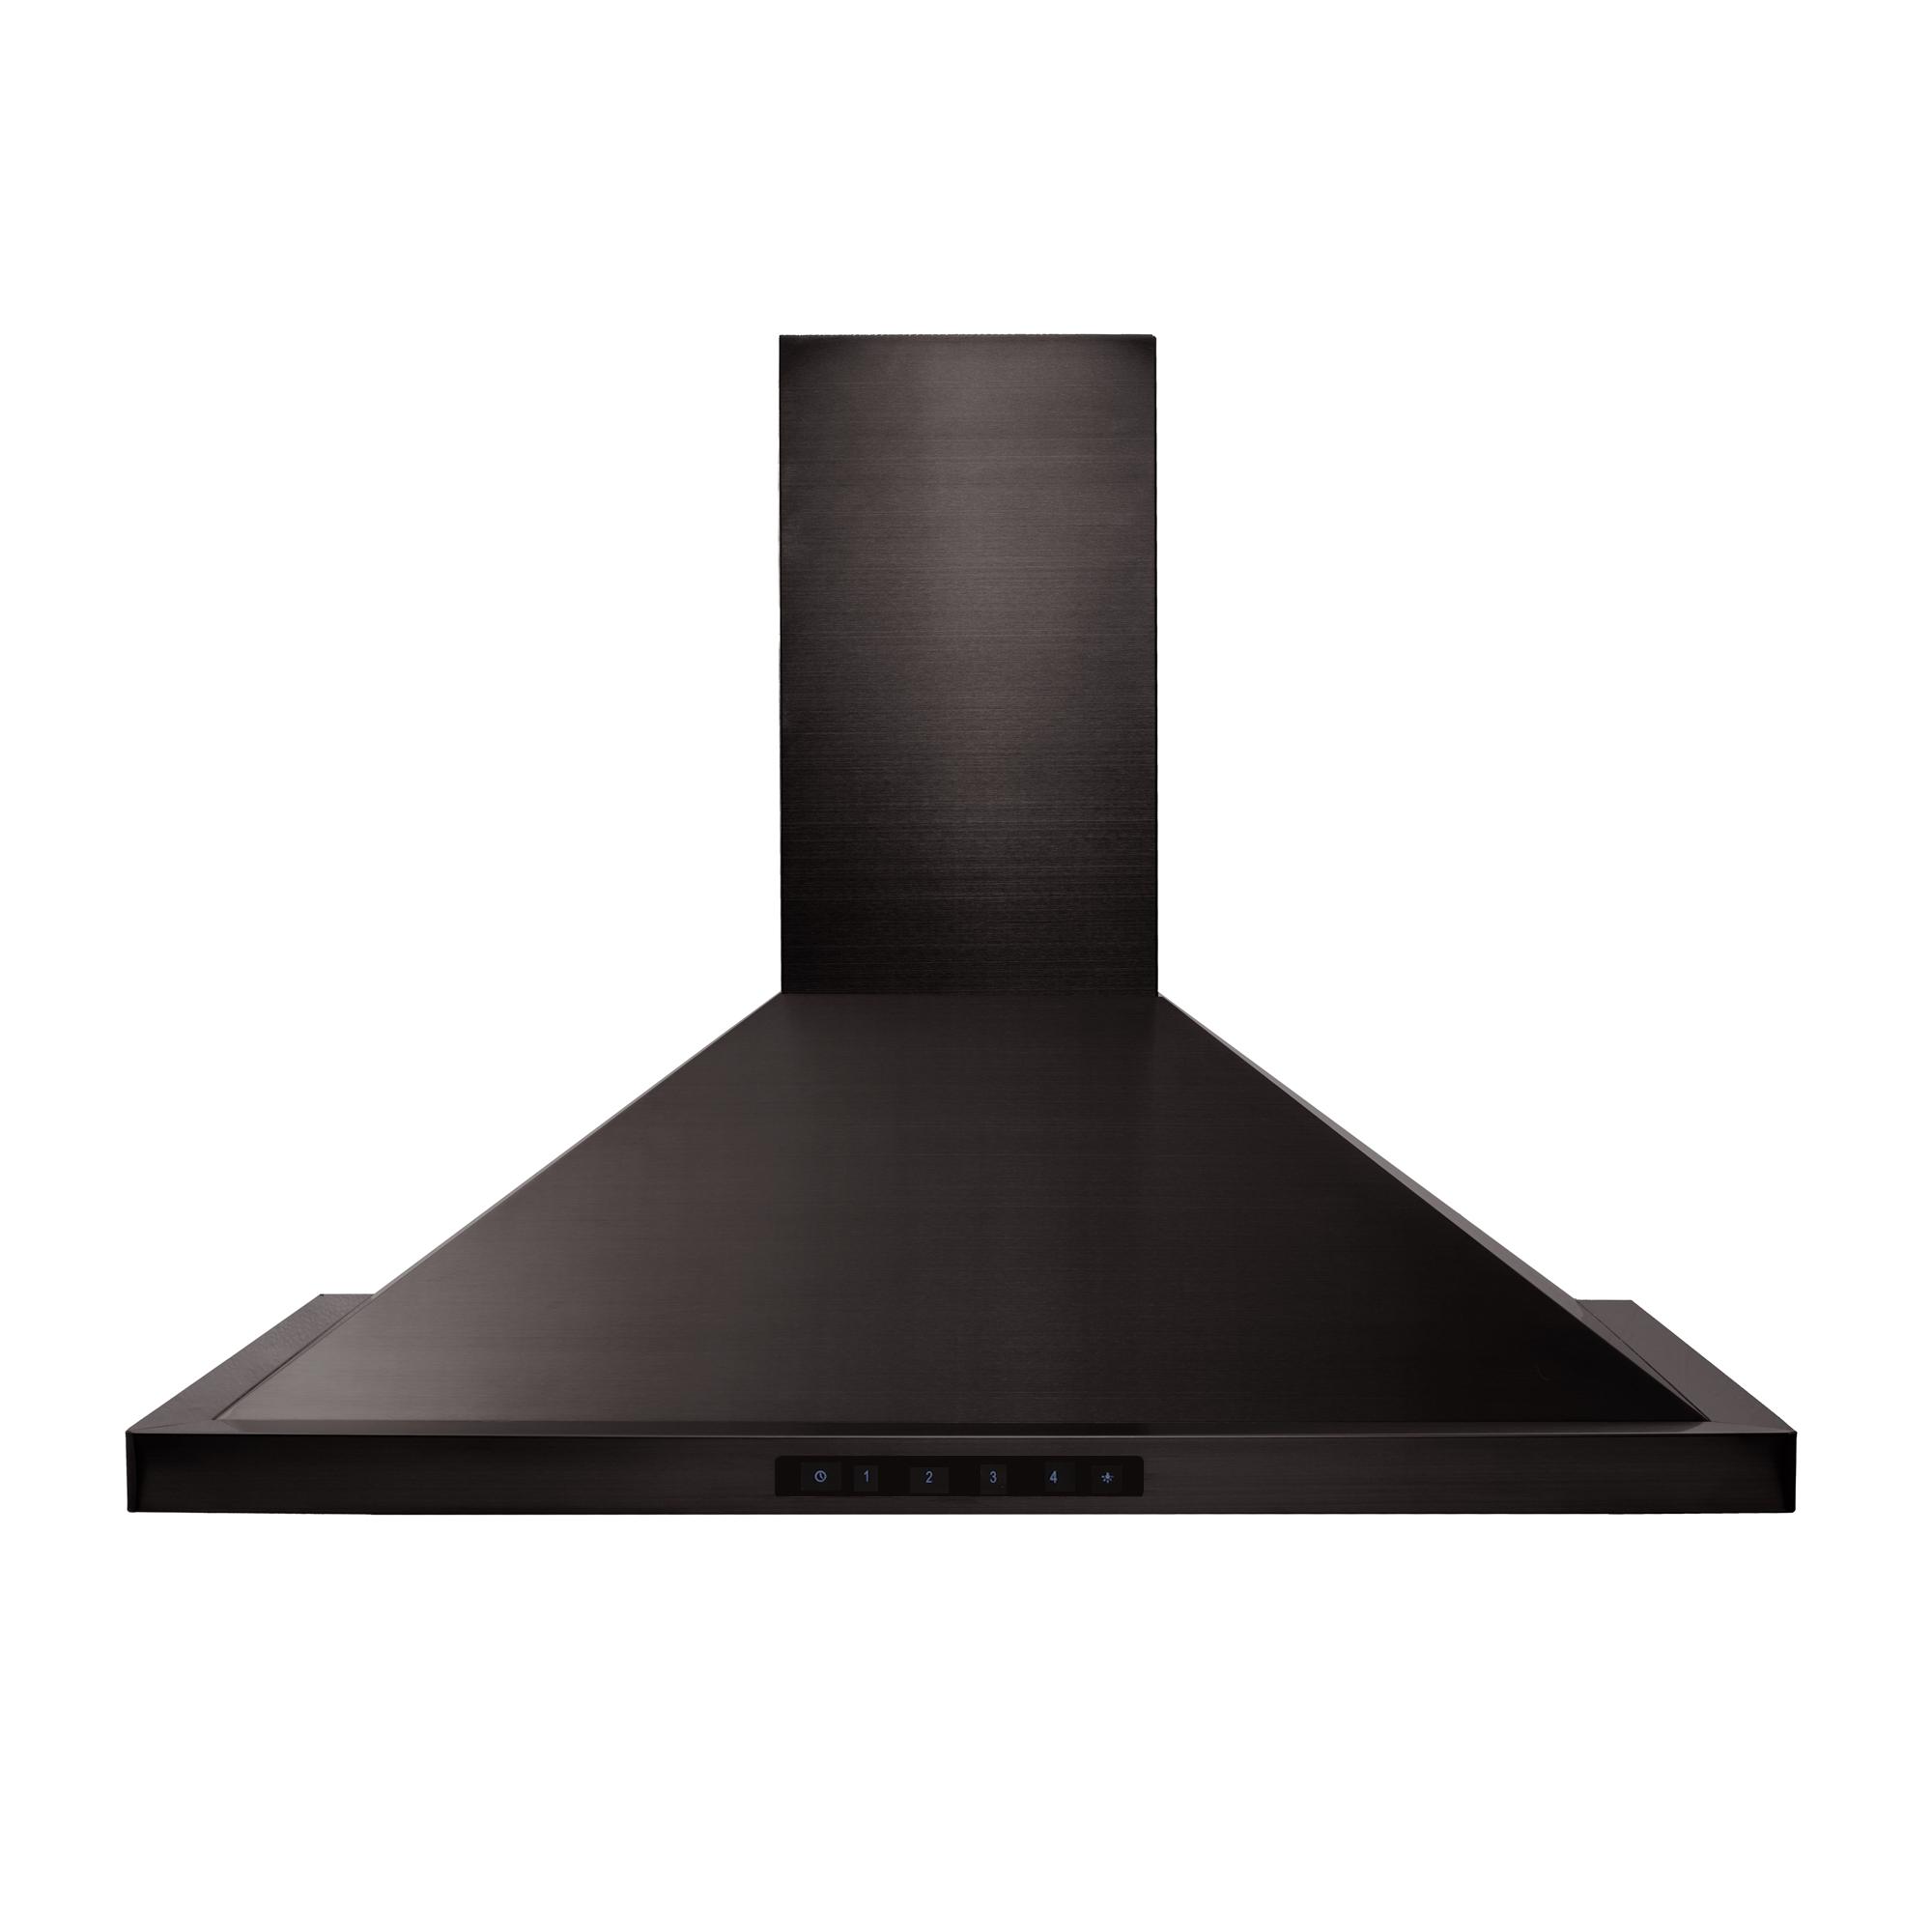 zline-black-stainless-steel-wall-mounted-range-hood-BSKBN_front.jpg